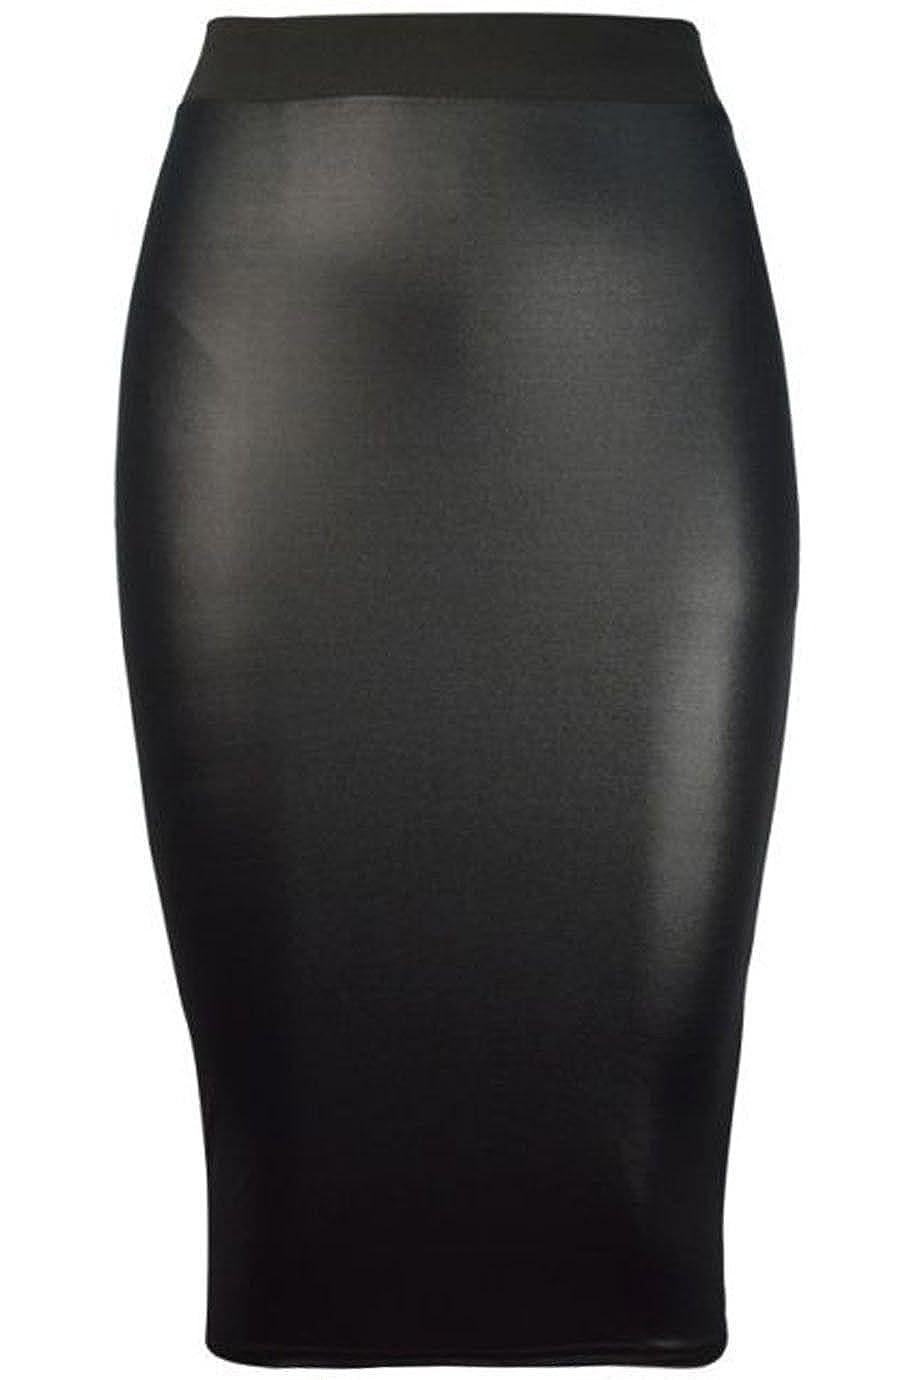 Forever Womens Celebrity Inspired High Waisted Wetlook Bodycon Pencil Skirt